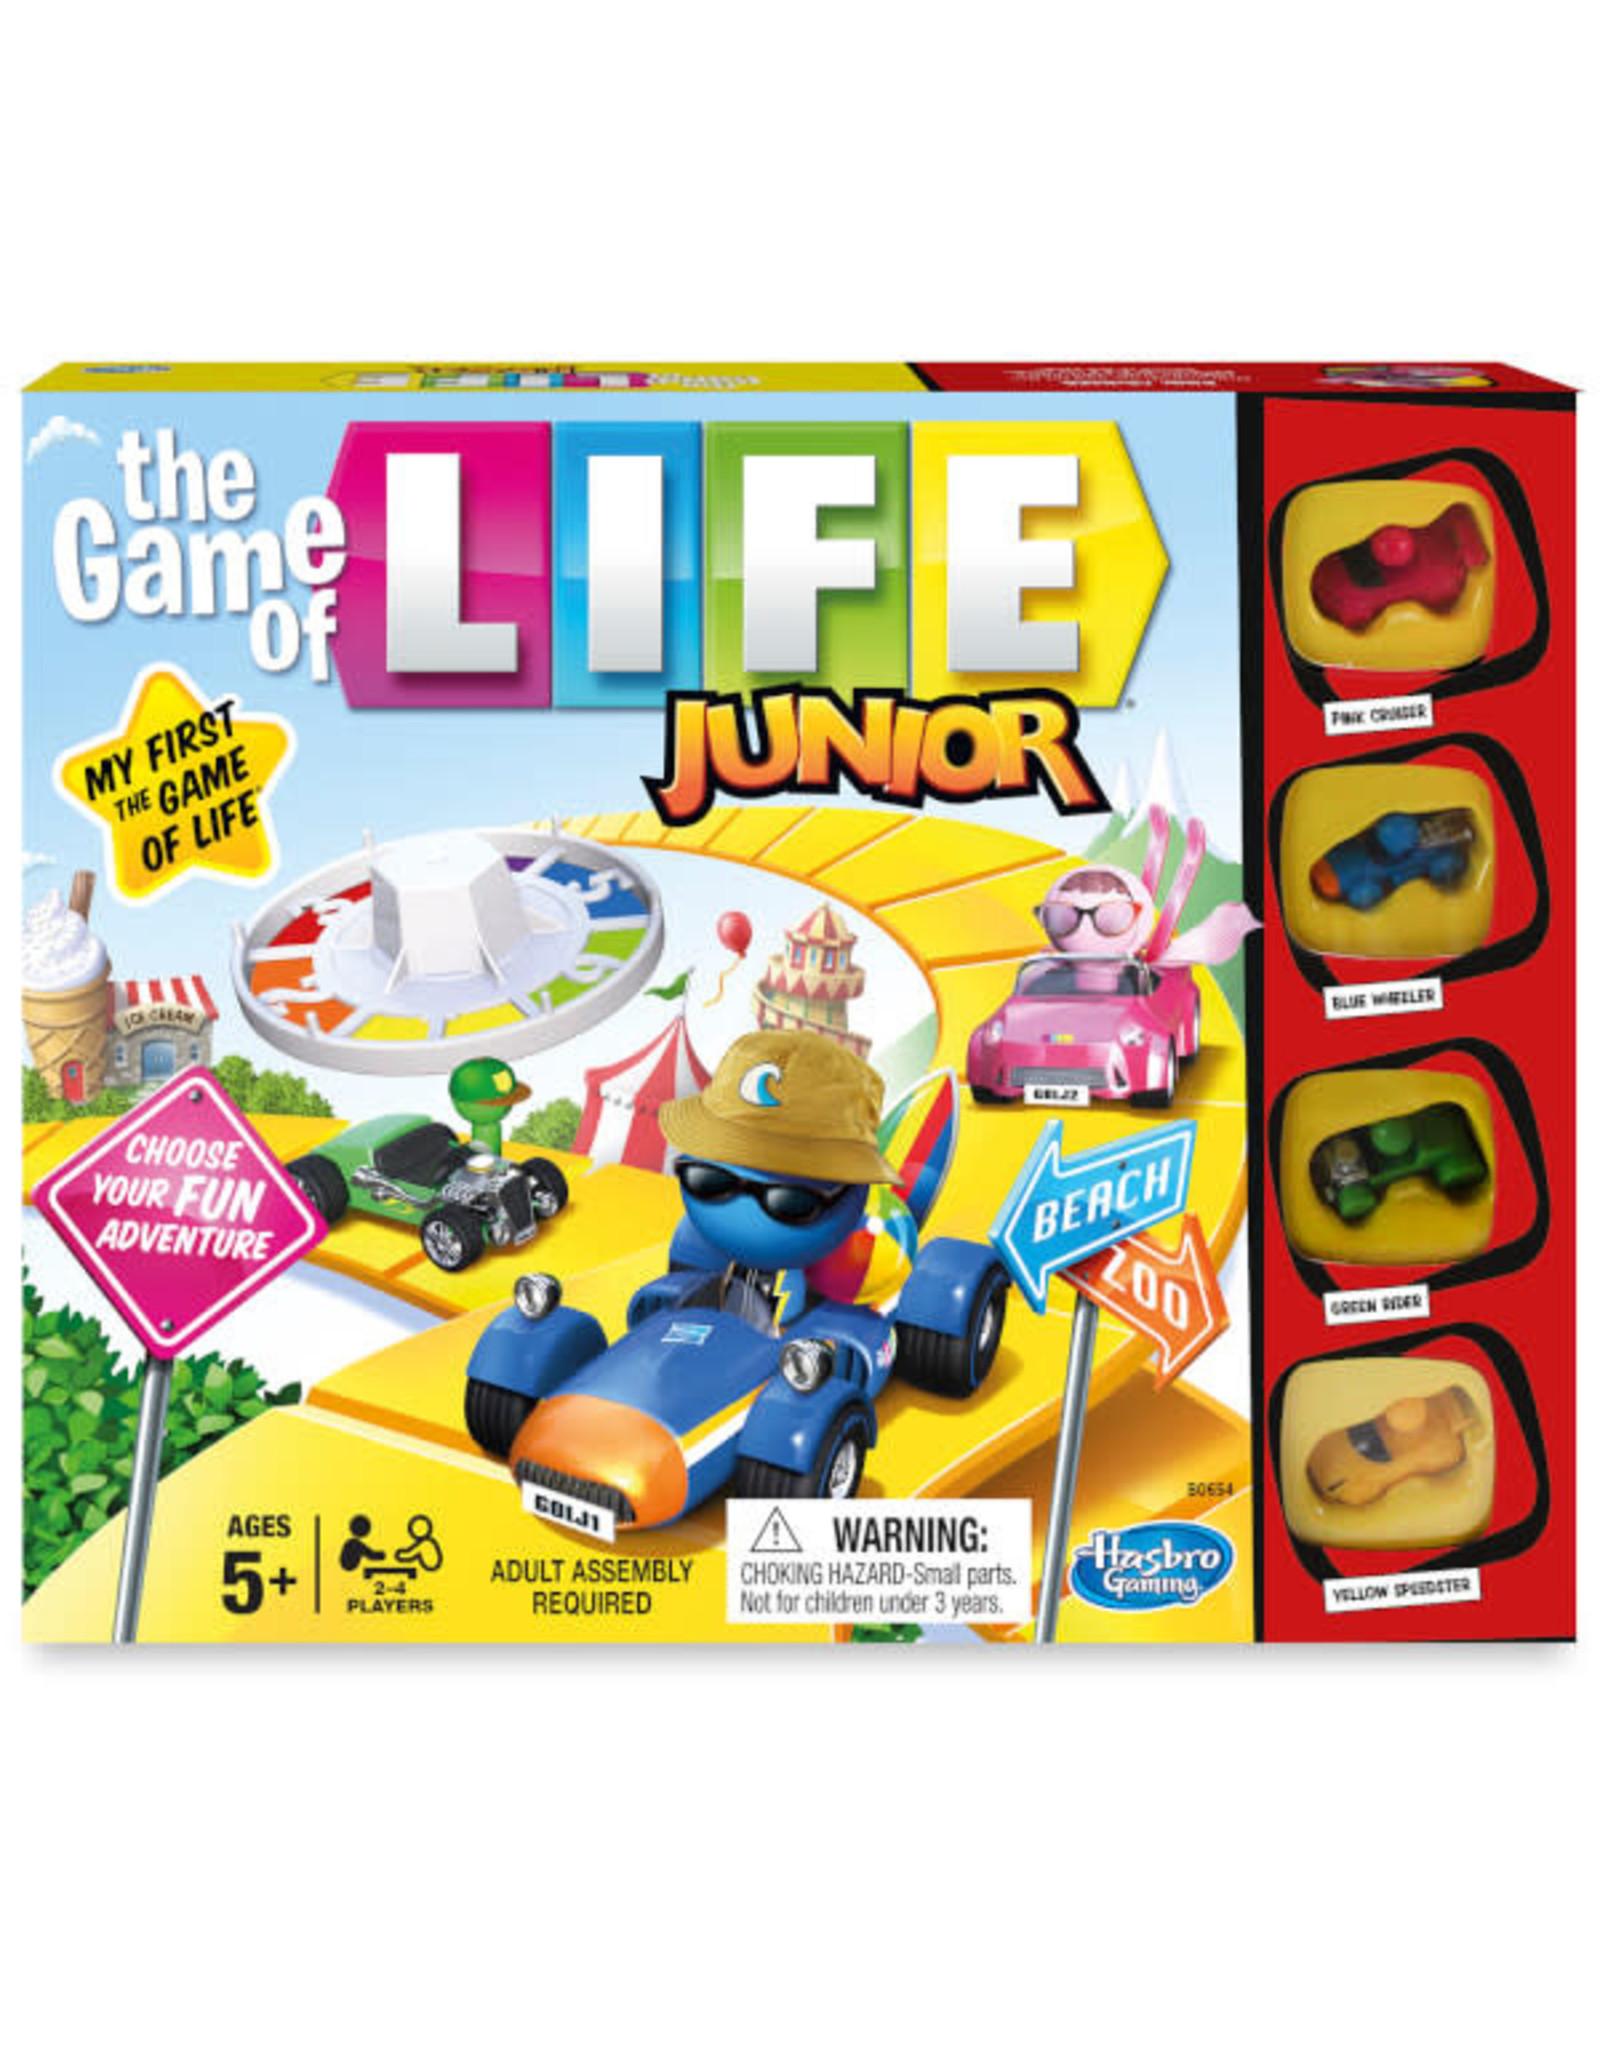 Hasbro Game Of Life Jr.